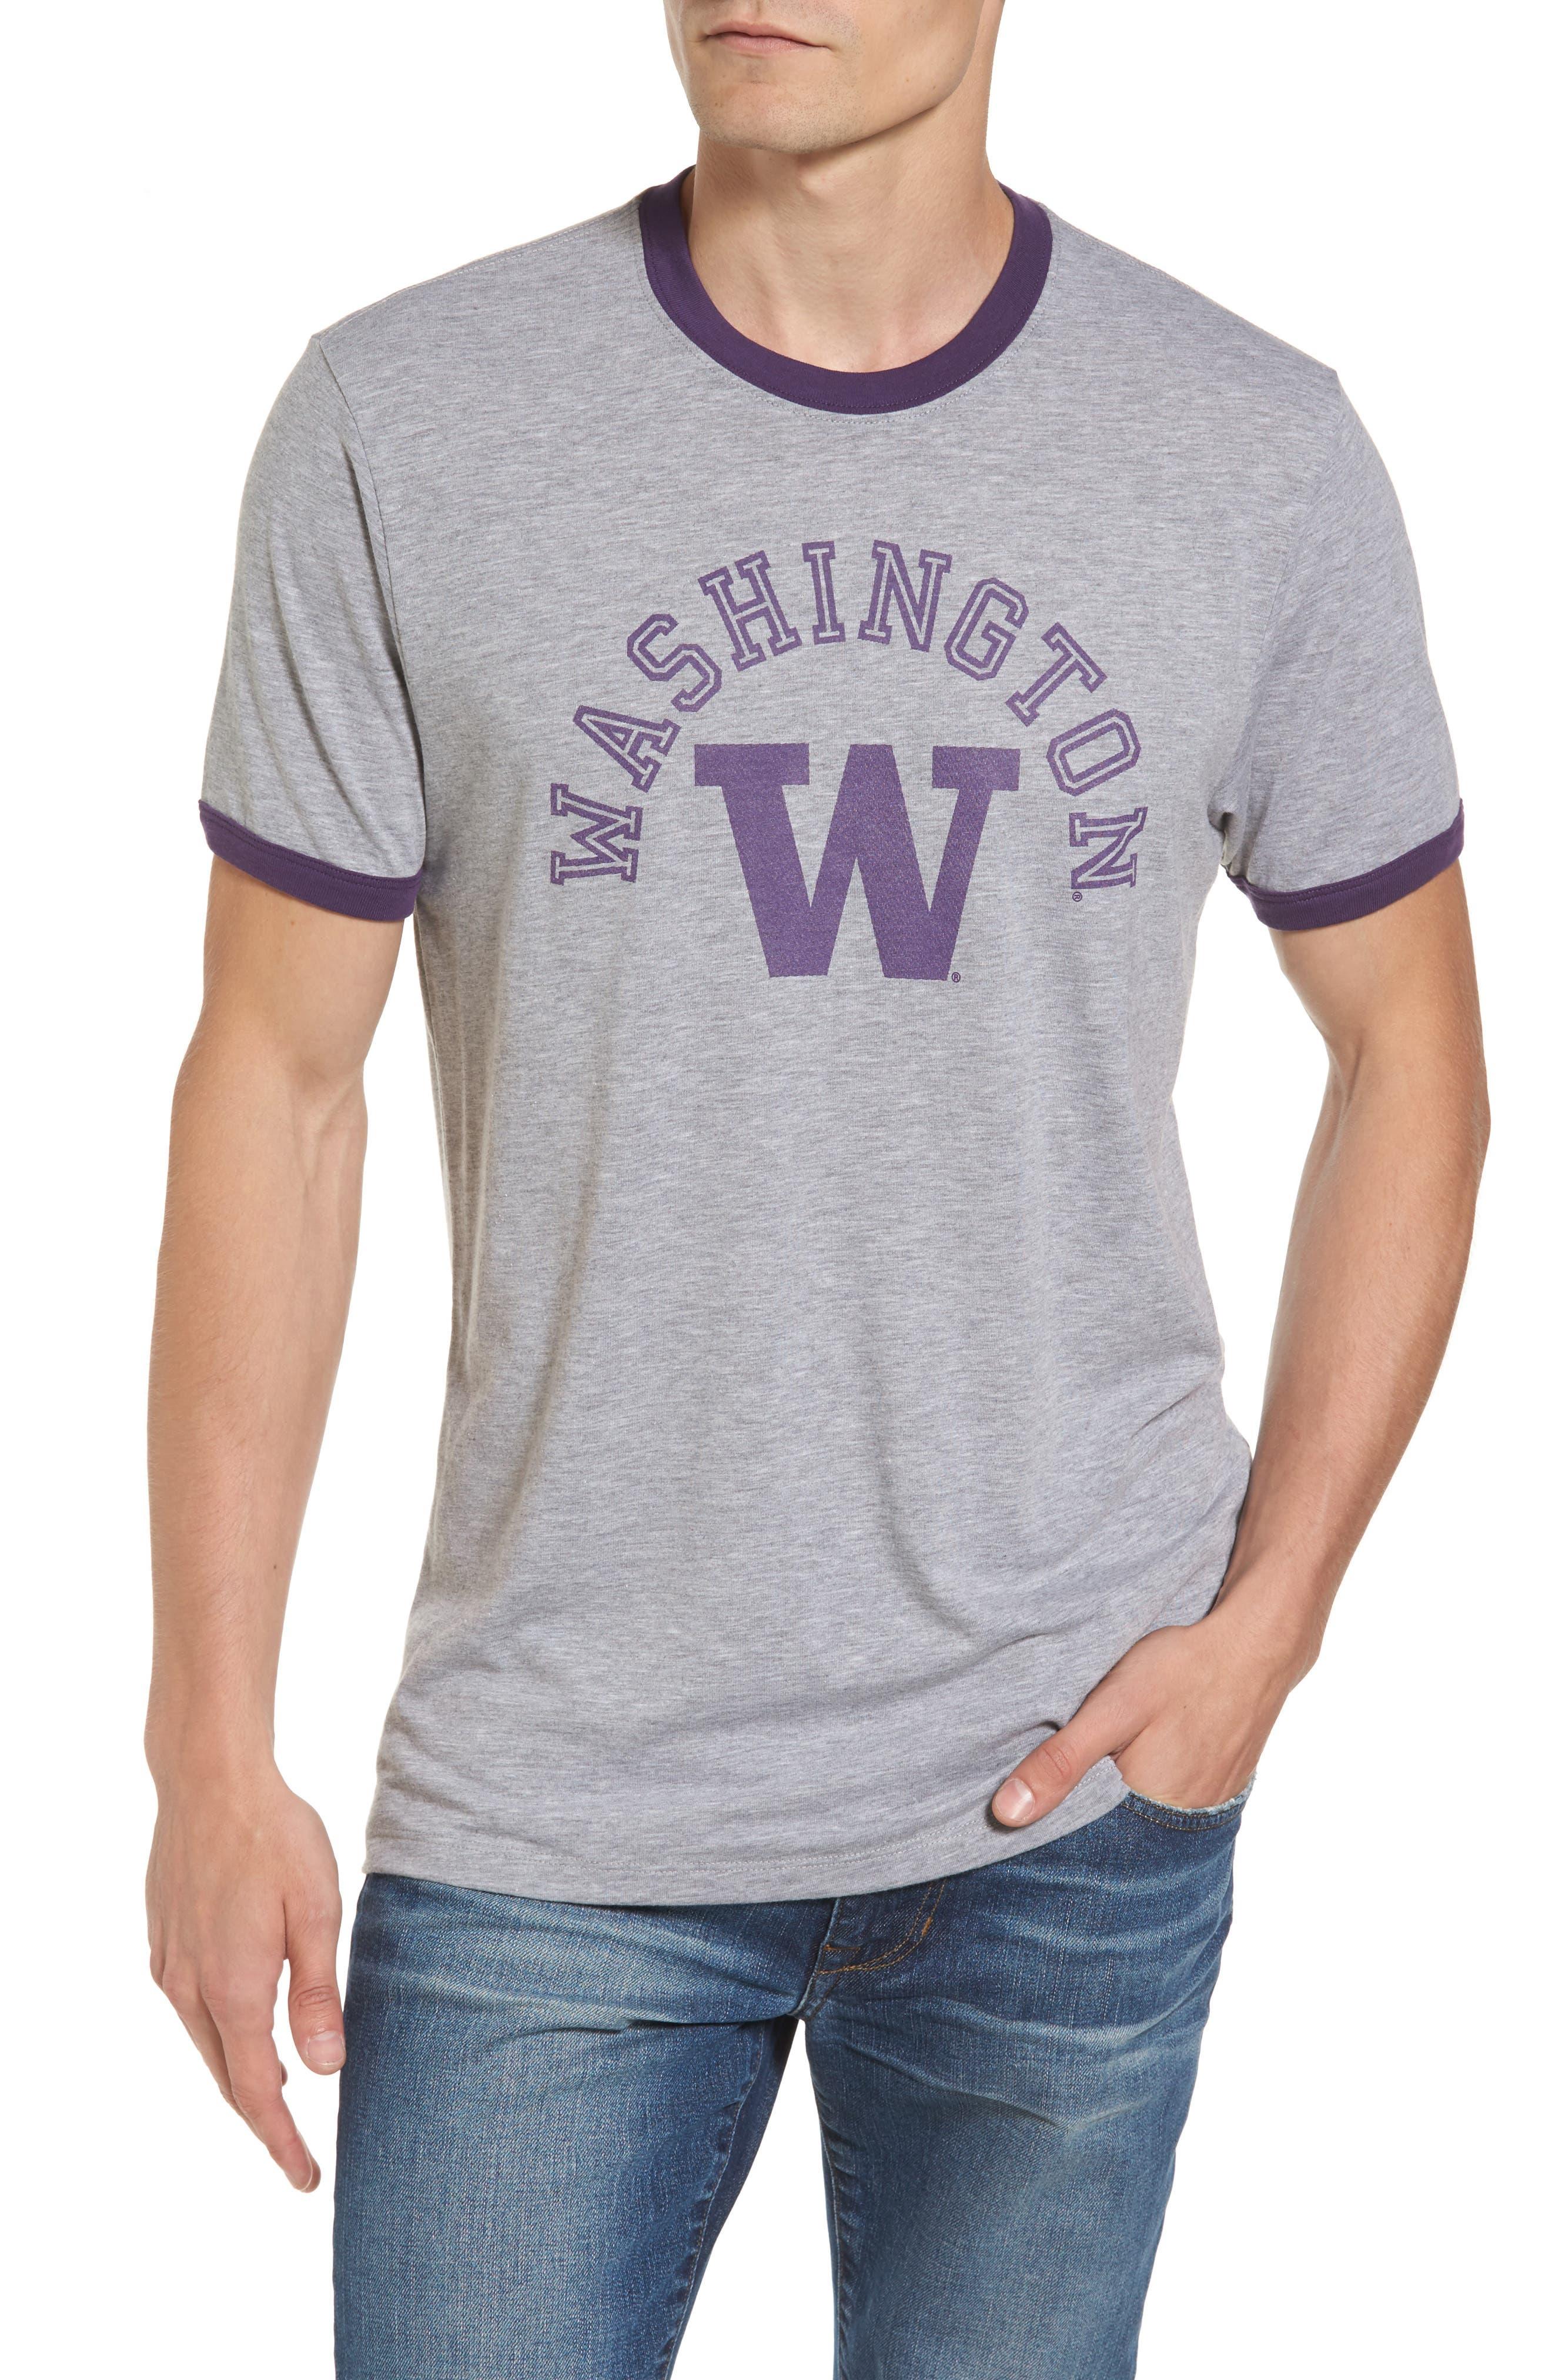 University of Washington Huskies Ringer T-Shirt,                         Main,                         color, 020